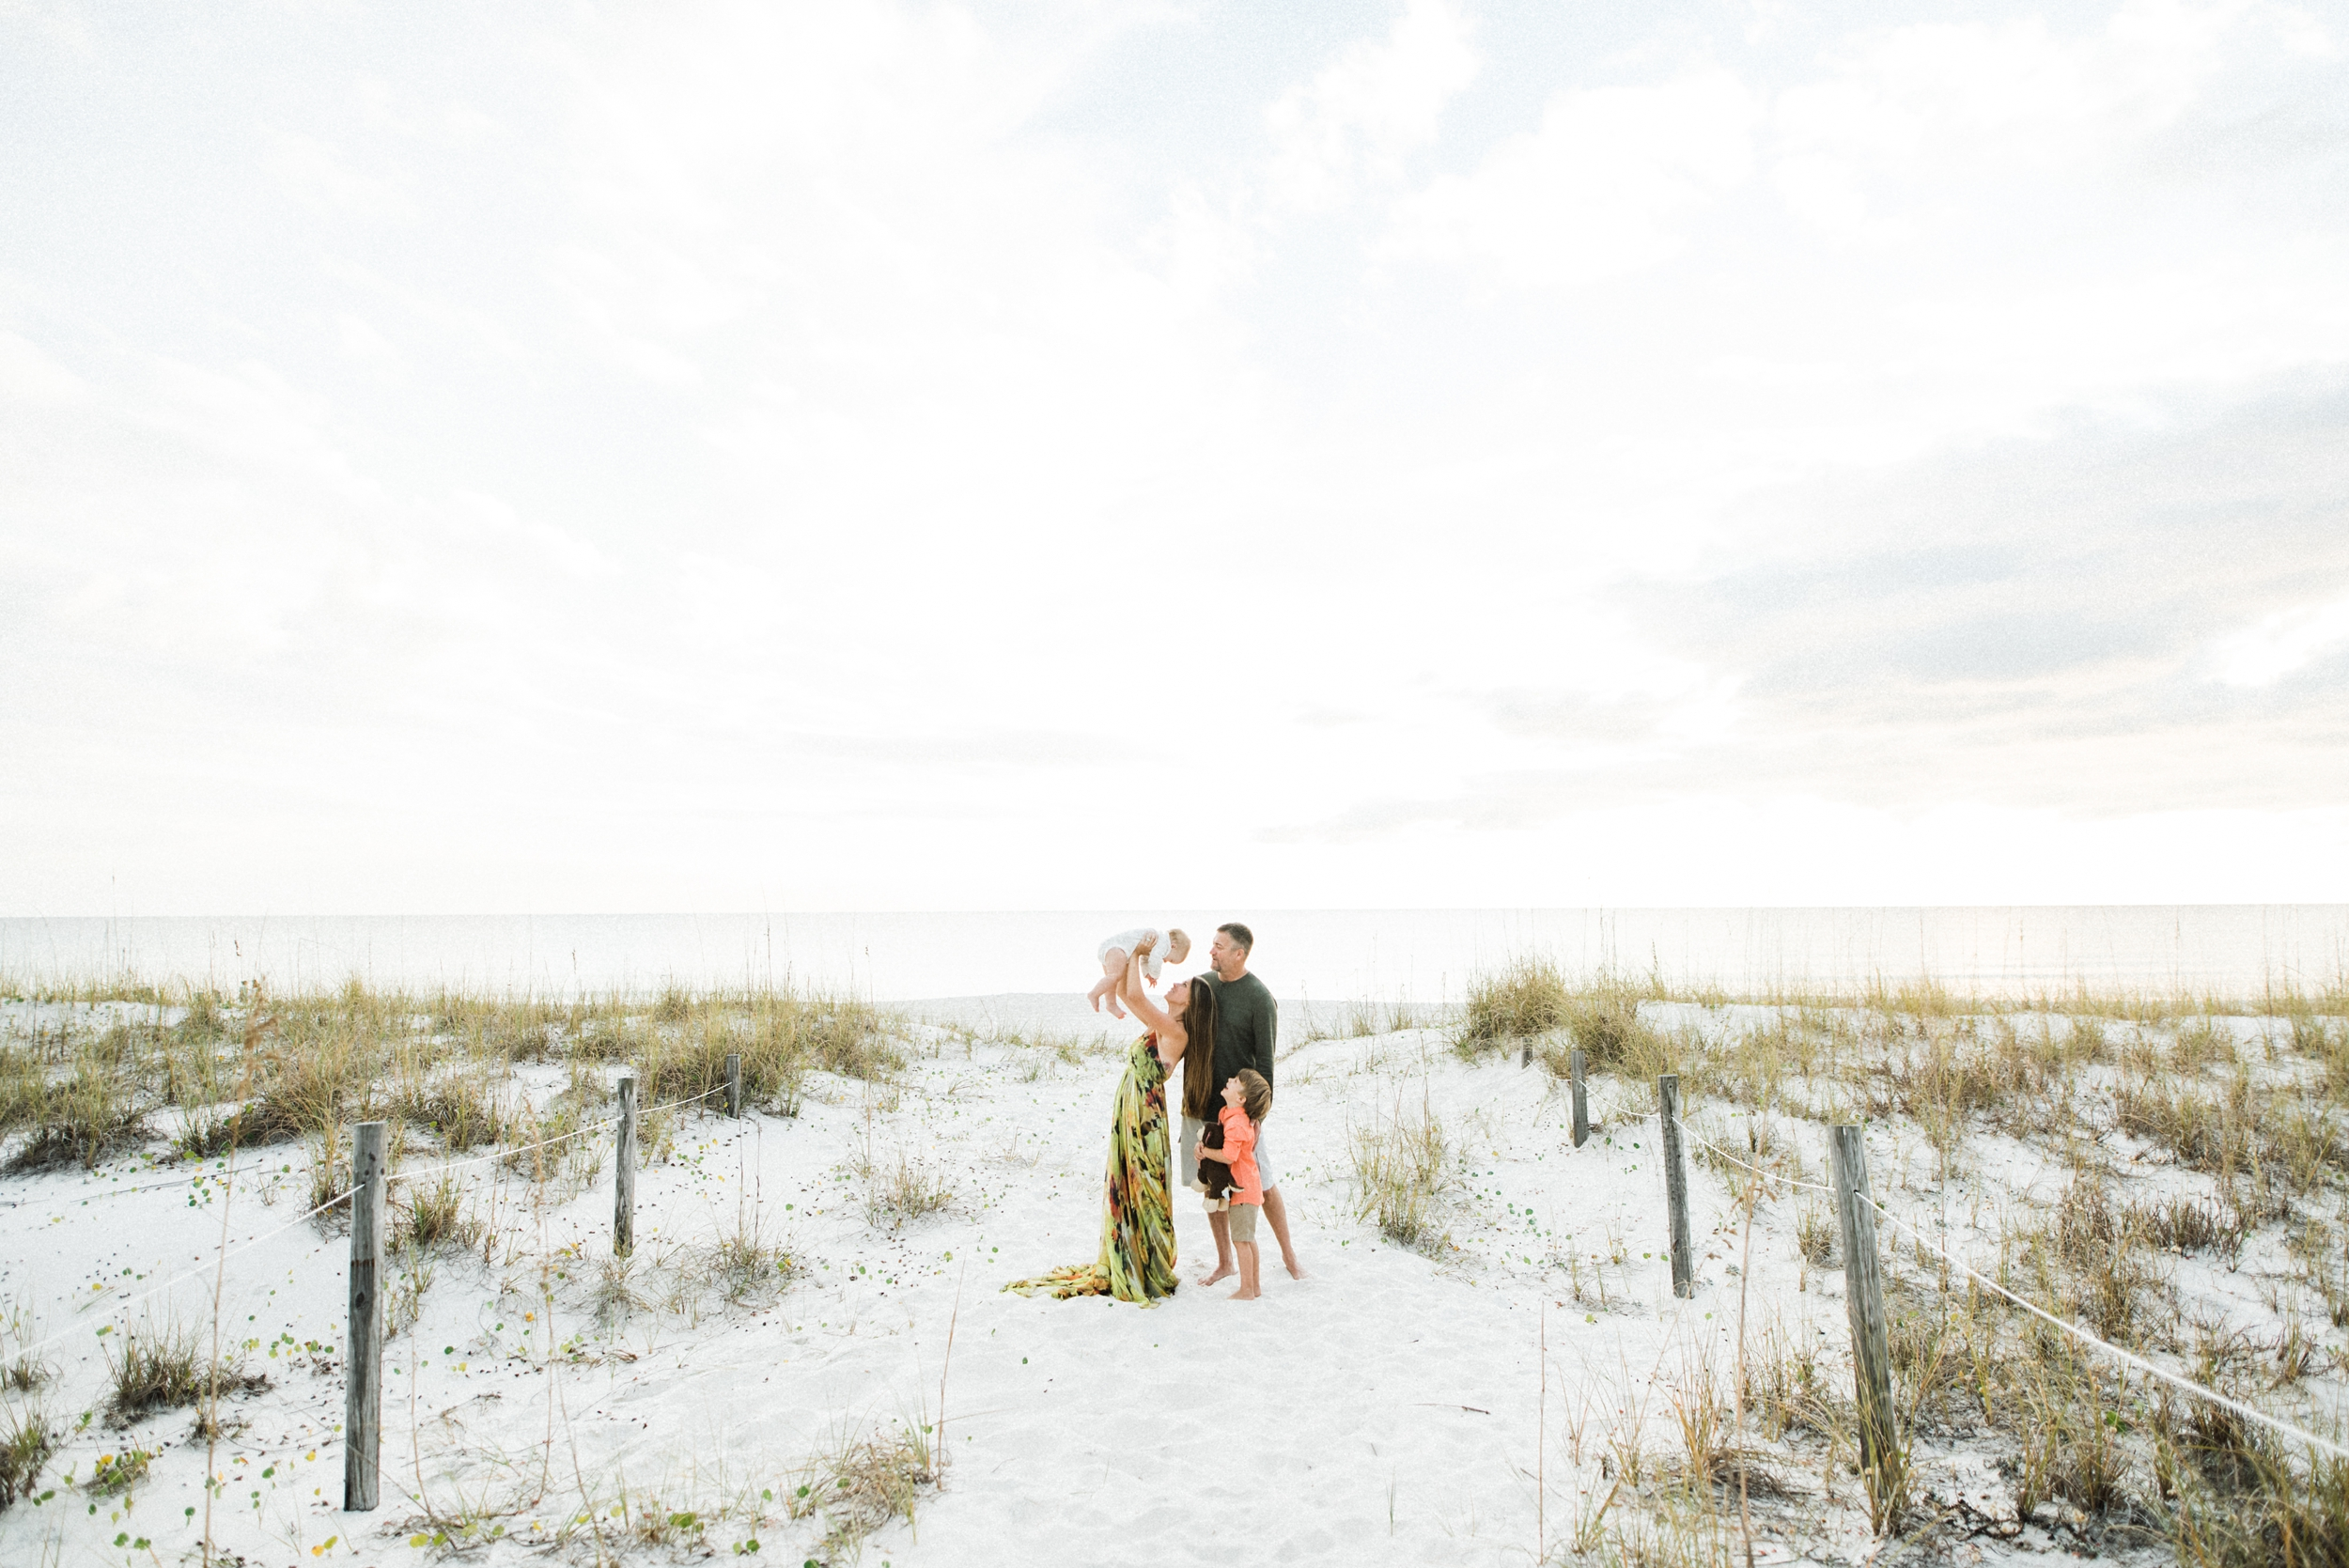 desiree-gardner-photography-pairs-france-monet-garden-monets-couple-wedding-engagement-giverny-30-a-30a-florida_0066.jpg